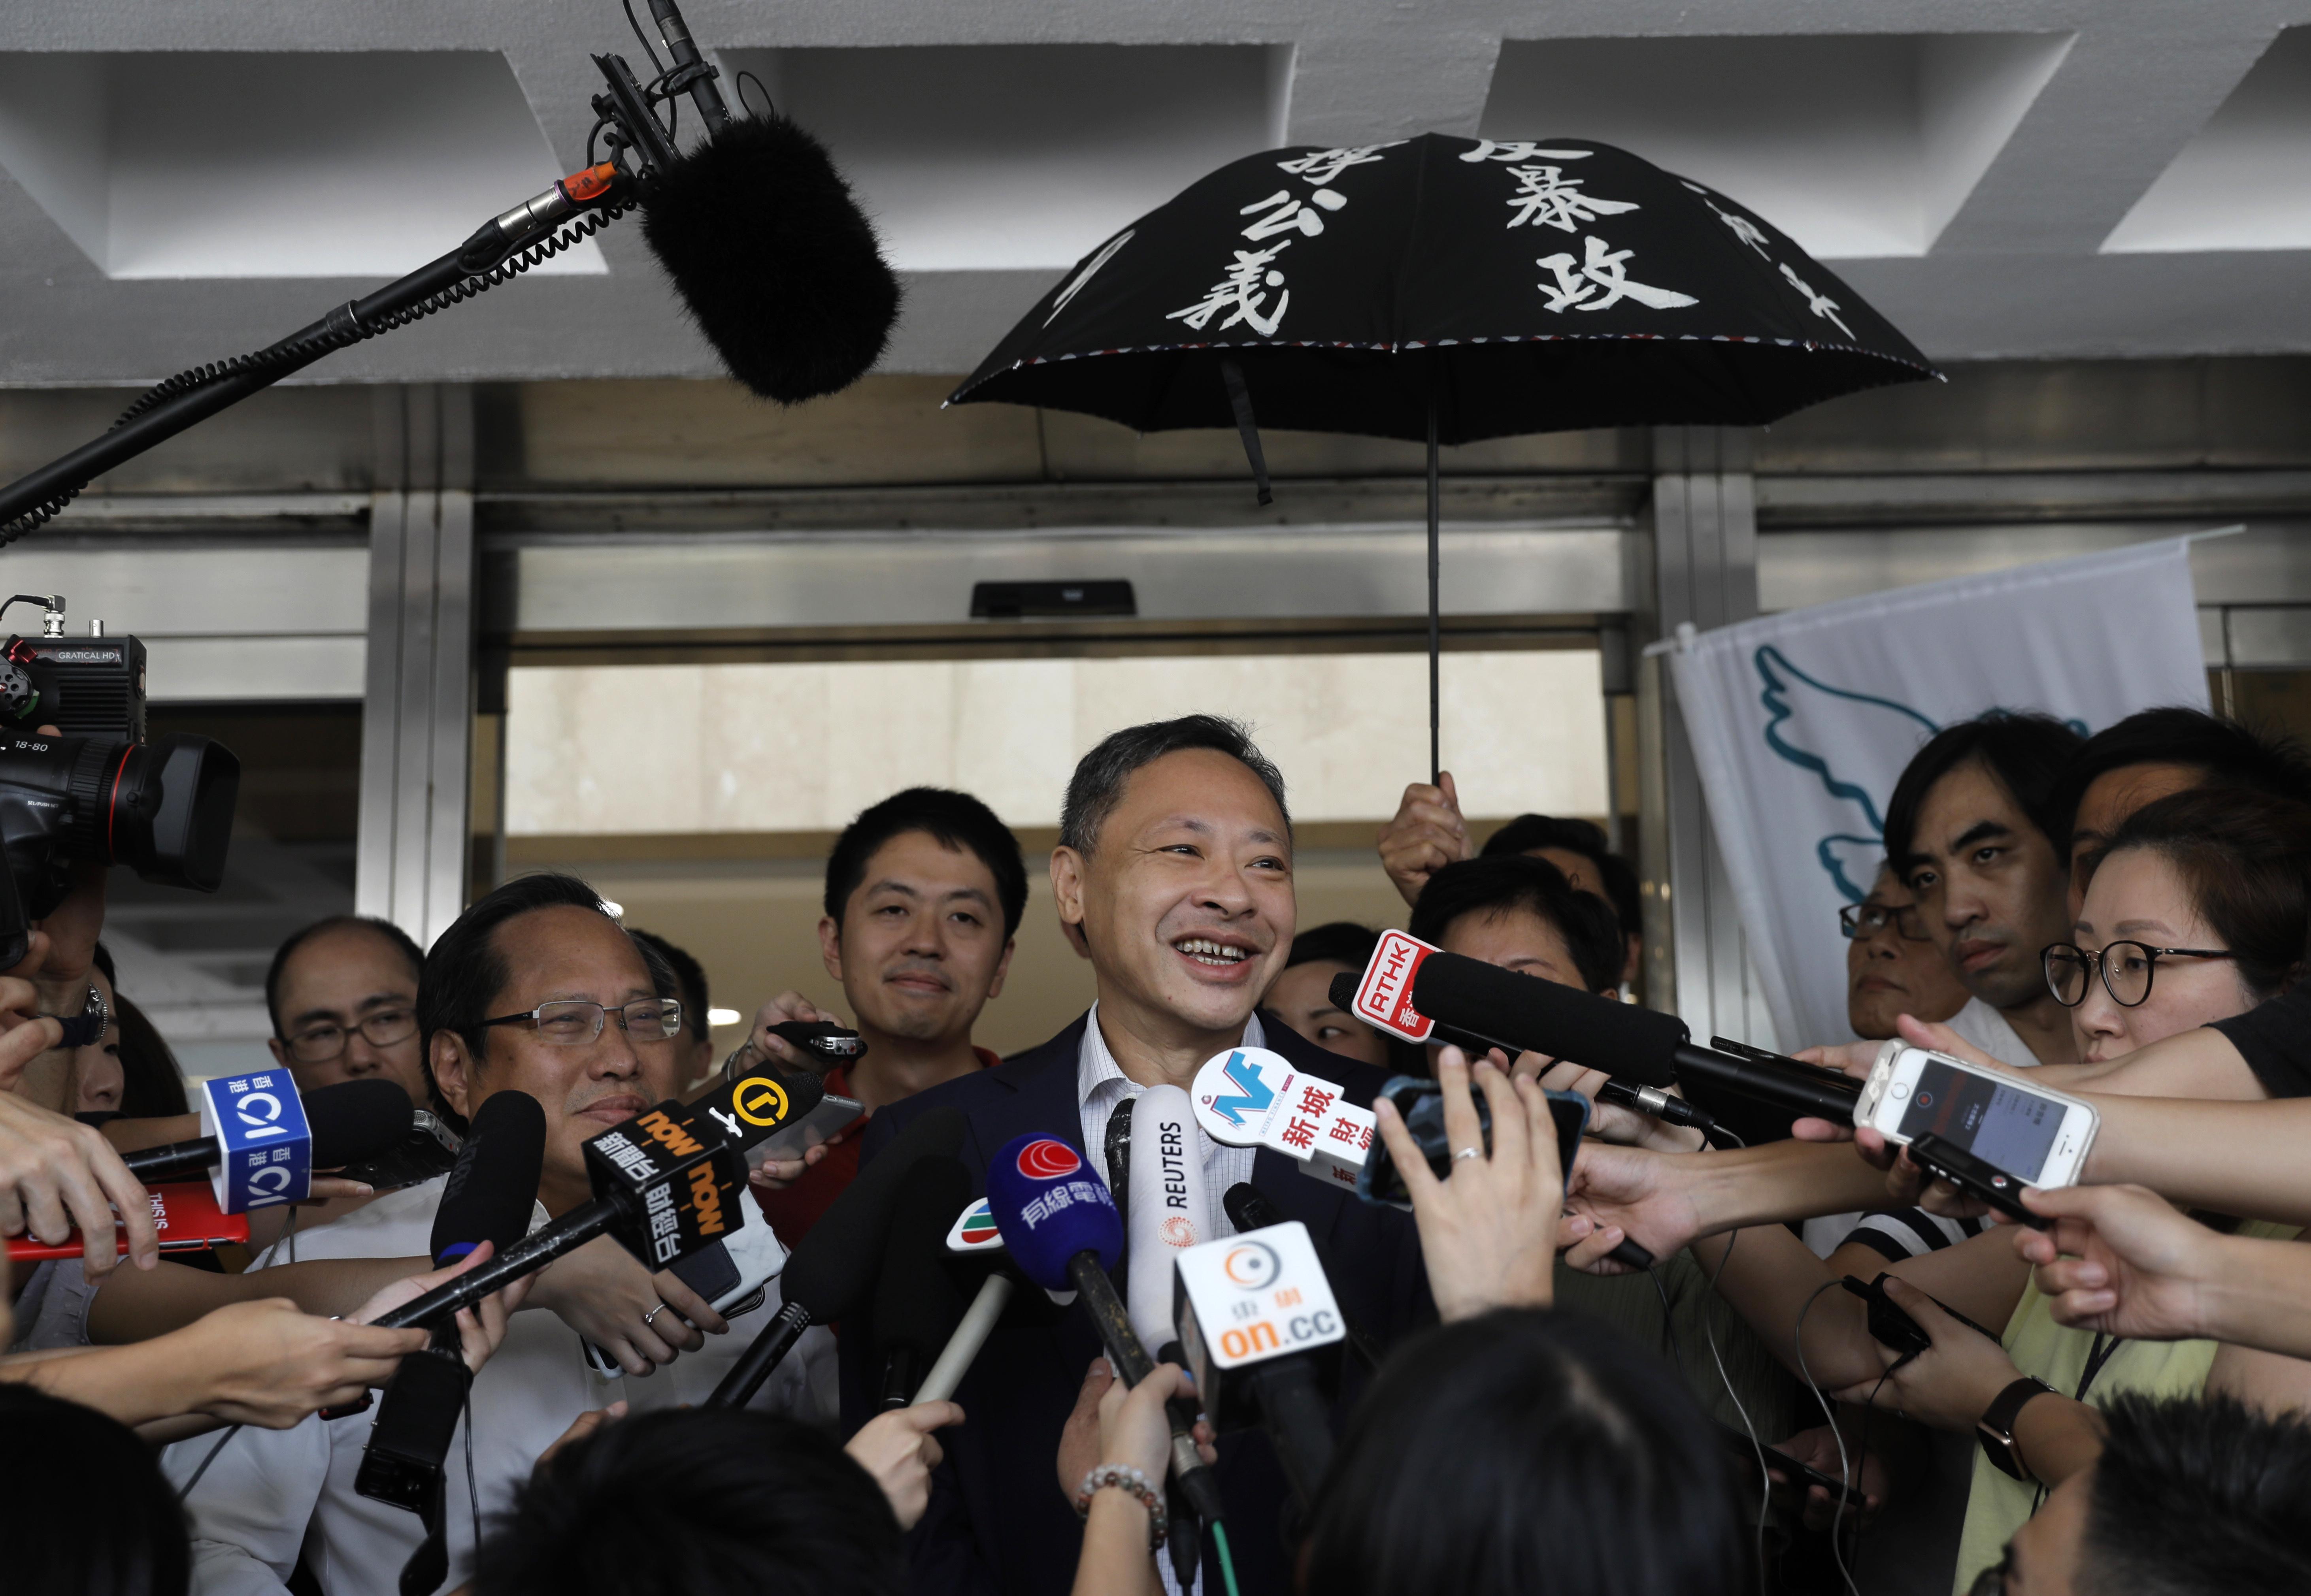 Hong Kong police: not aware of any military plans by China